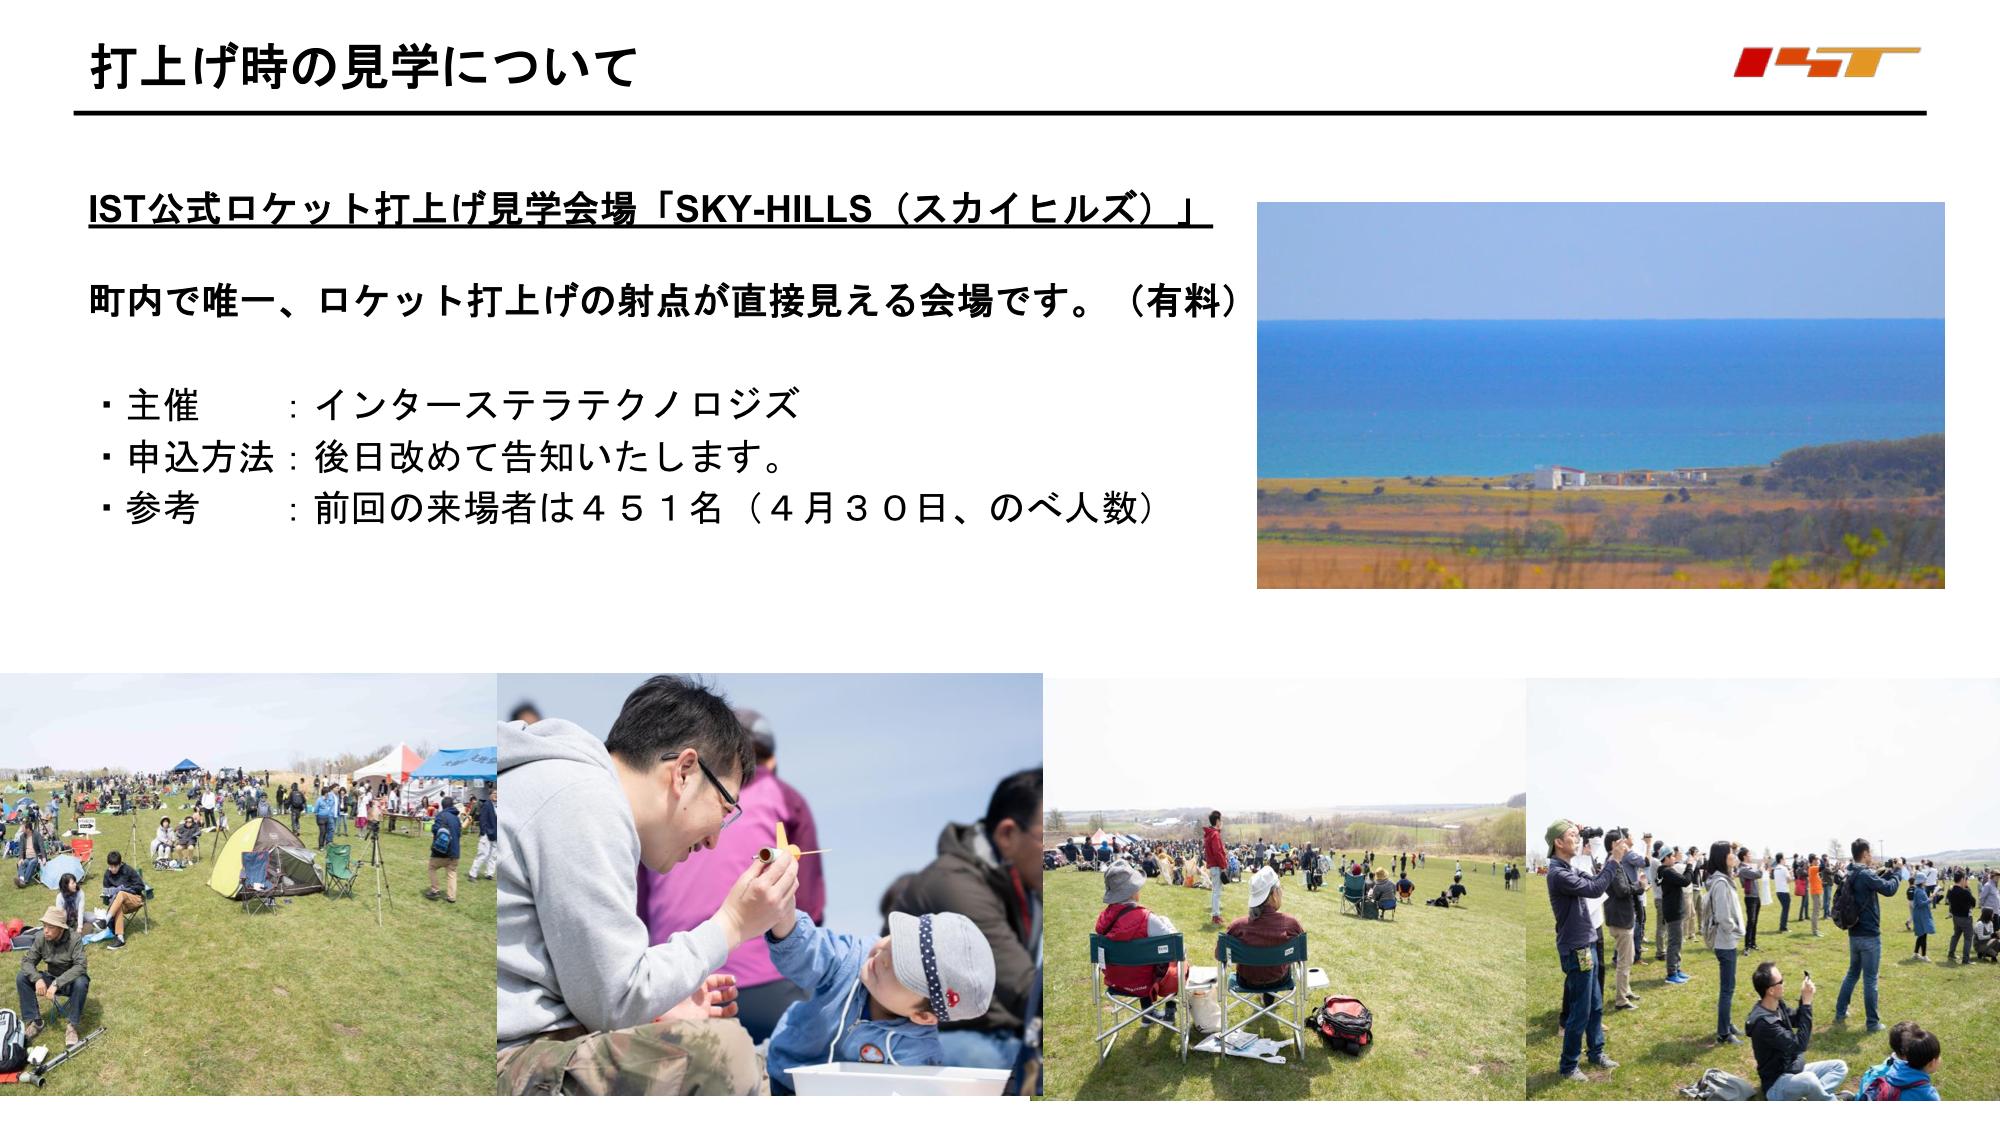 f:id:Imamura:20190628161412p:plain